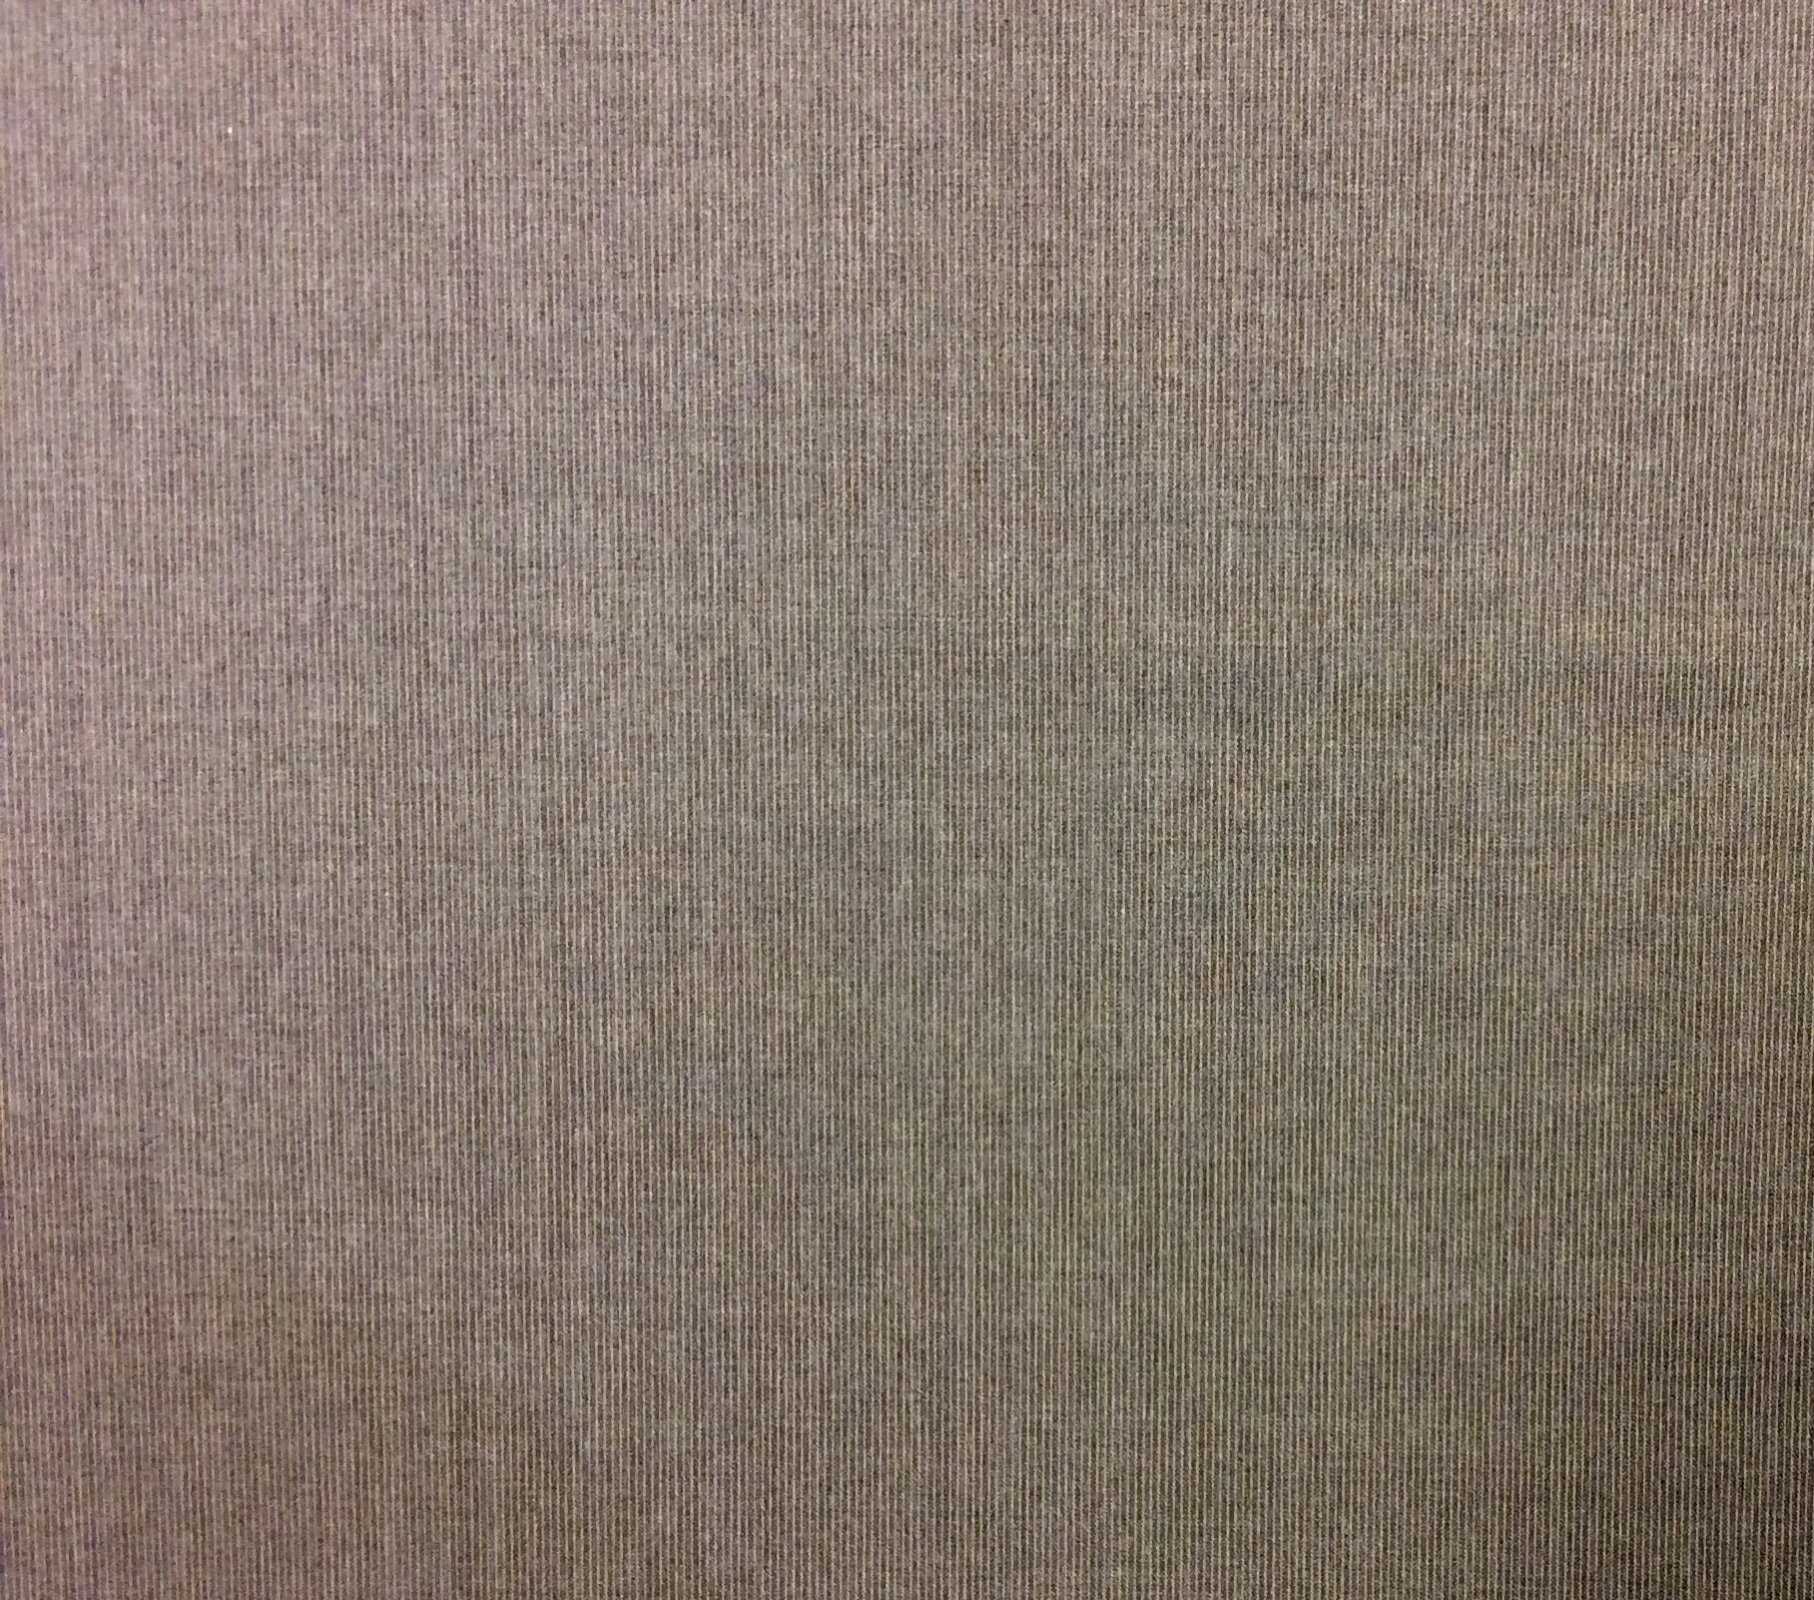 ITALY Wool  Apparel Fabric RMJK1353